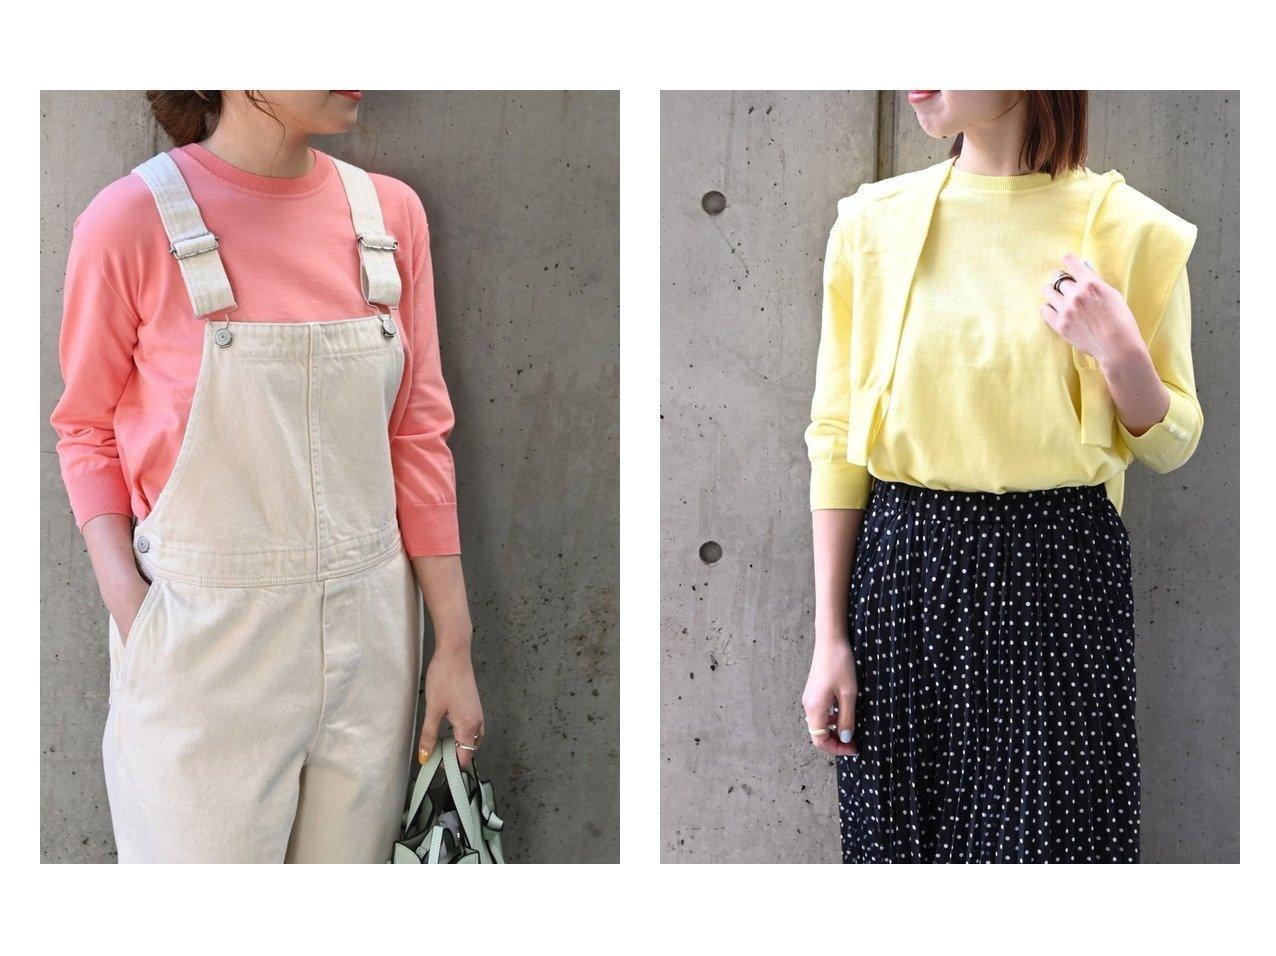 【SHIPS any/シップス エニィ】のSHIPS any ファインコットン カラーニット クルーネック プルオーバー トップス・カットソーのおすすめ!人気、トレンド・レディースファッションの通販 おすすめで人気の流行・トレンド、ファッションの通販商品 メンズファッション・キッズファッション・インテリア・家具・レディースファッション・服の通販 founy(ファニー) https://founy.com/ ファッション Fashion レディースファッション WOMEN トップス Tops Tshirt ニット Knit Tops プルオーバー Pullover アンサンブル インナー オーガニック カーディガン 抗菌 シンプル デニム ベーシック 再入荷 Restock/Back in Stock/Re Arrival NEW・新作・新着・新入荷 New Arrivals |ID:crp329100000014810